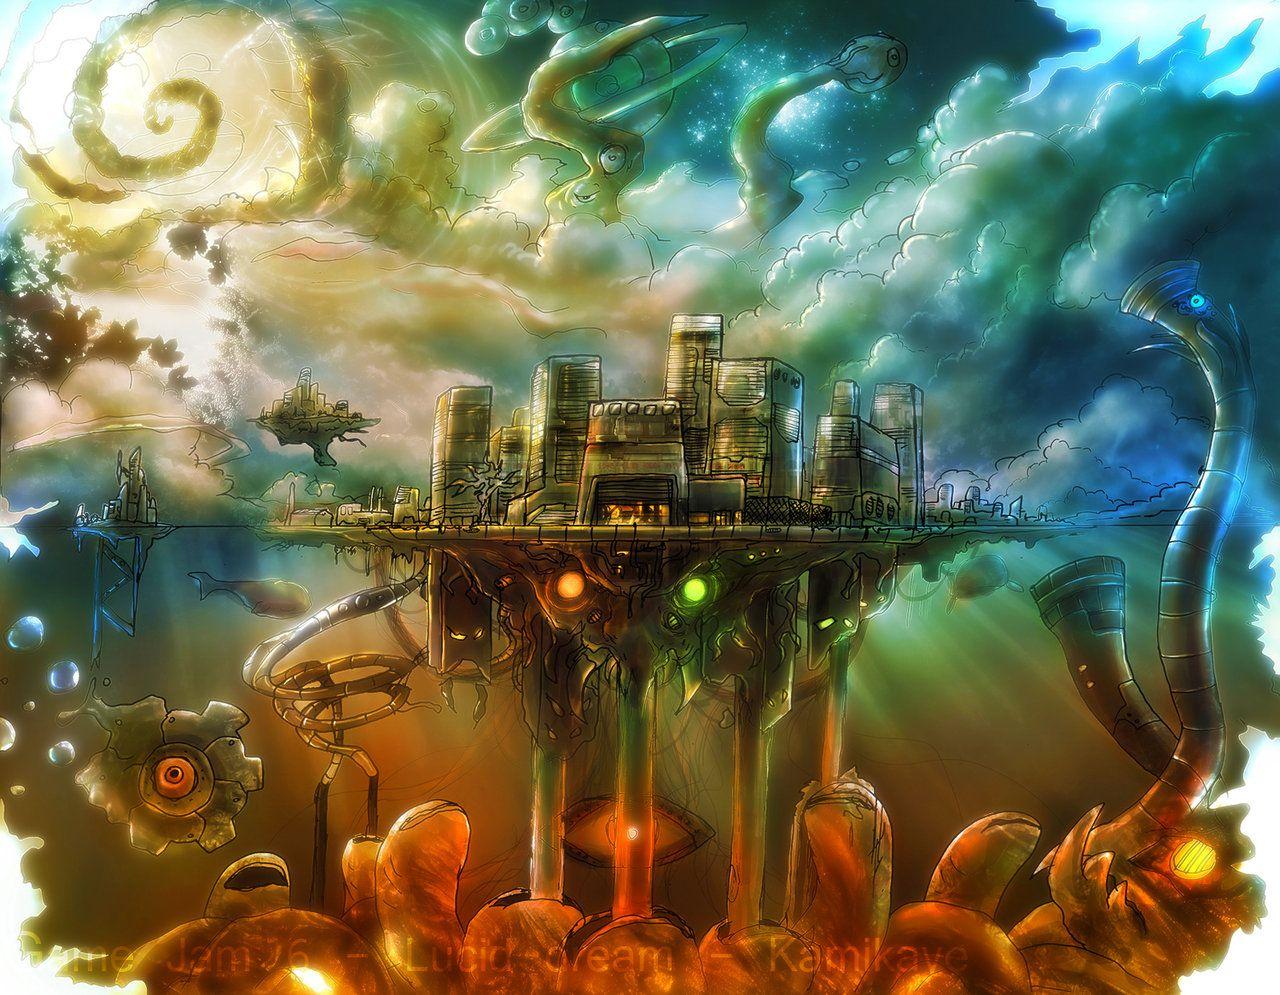 Dream world (With images) Dream art, Japanese art modern